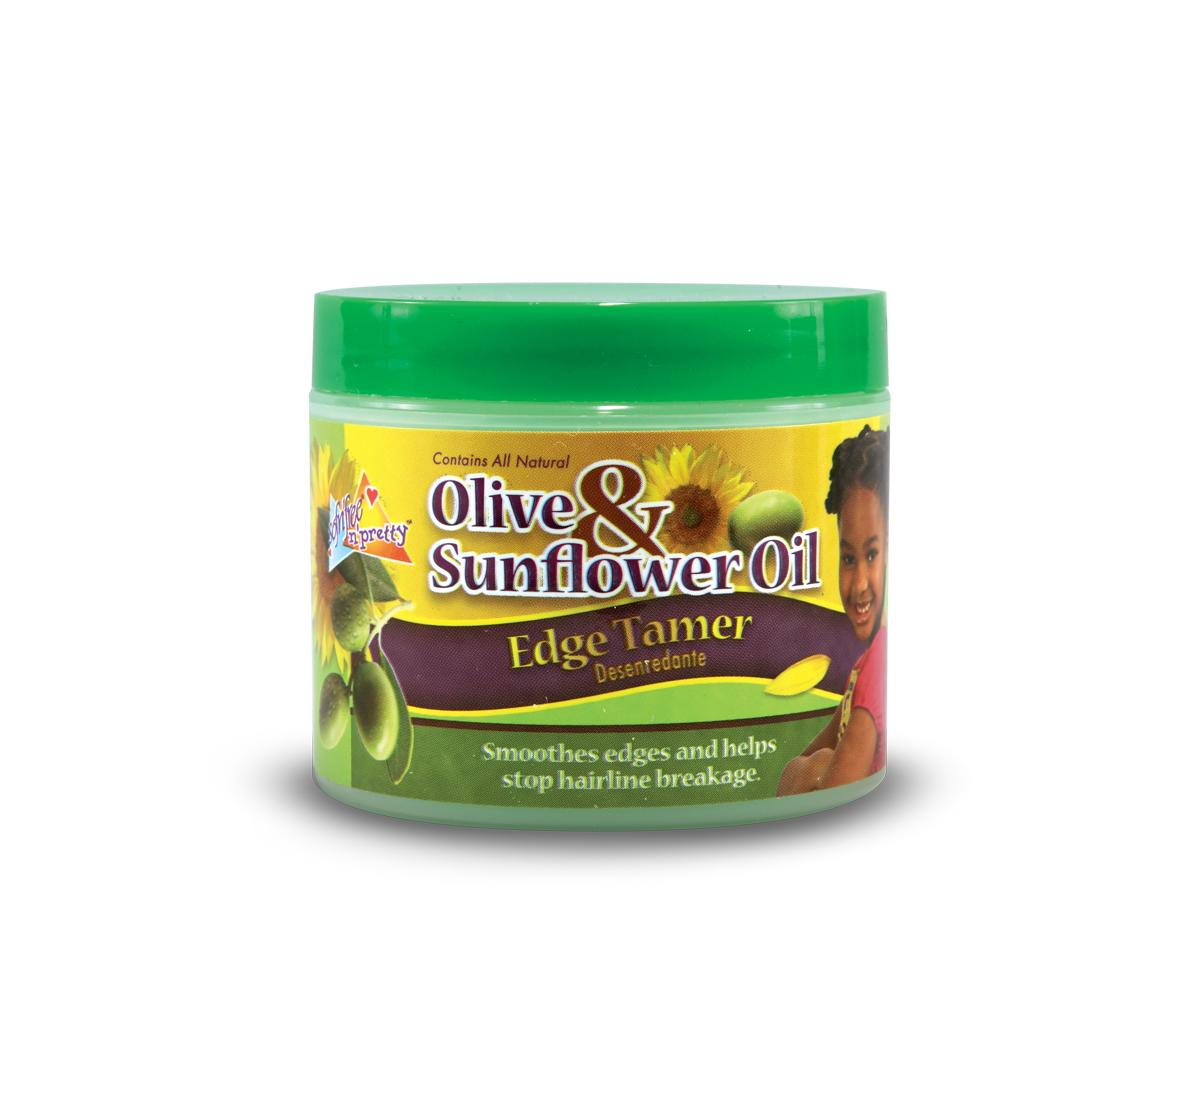 Olive and Sunflower Oil Edge Tamer